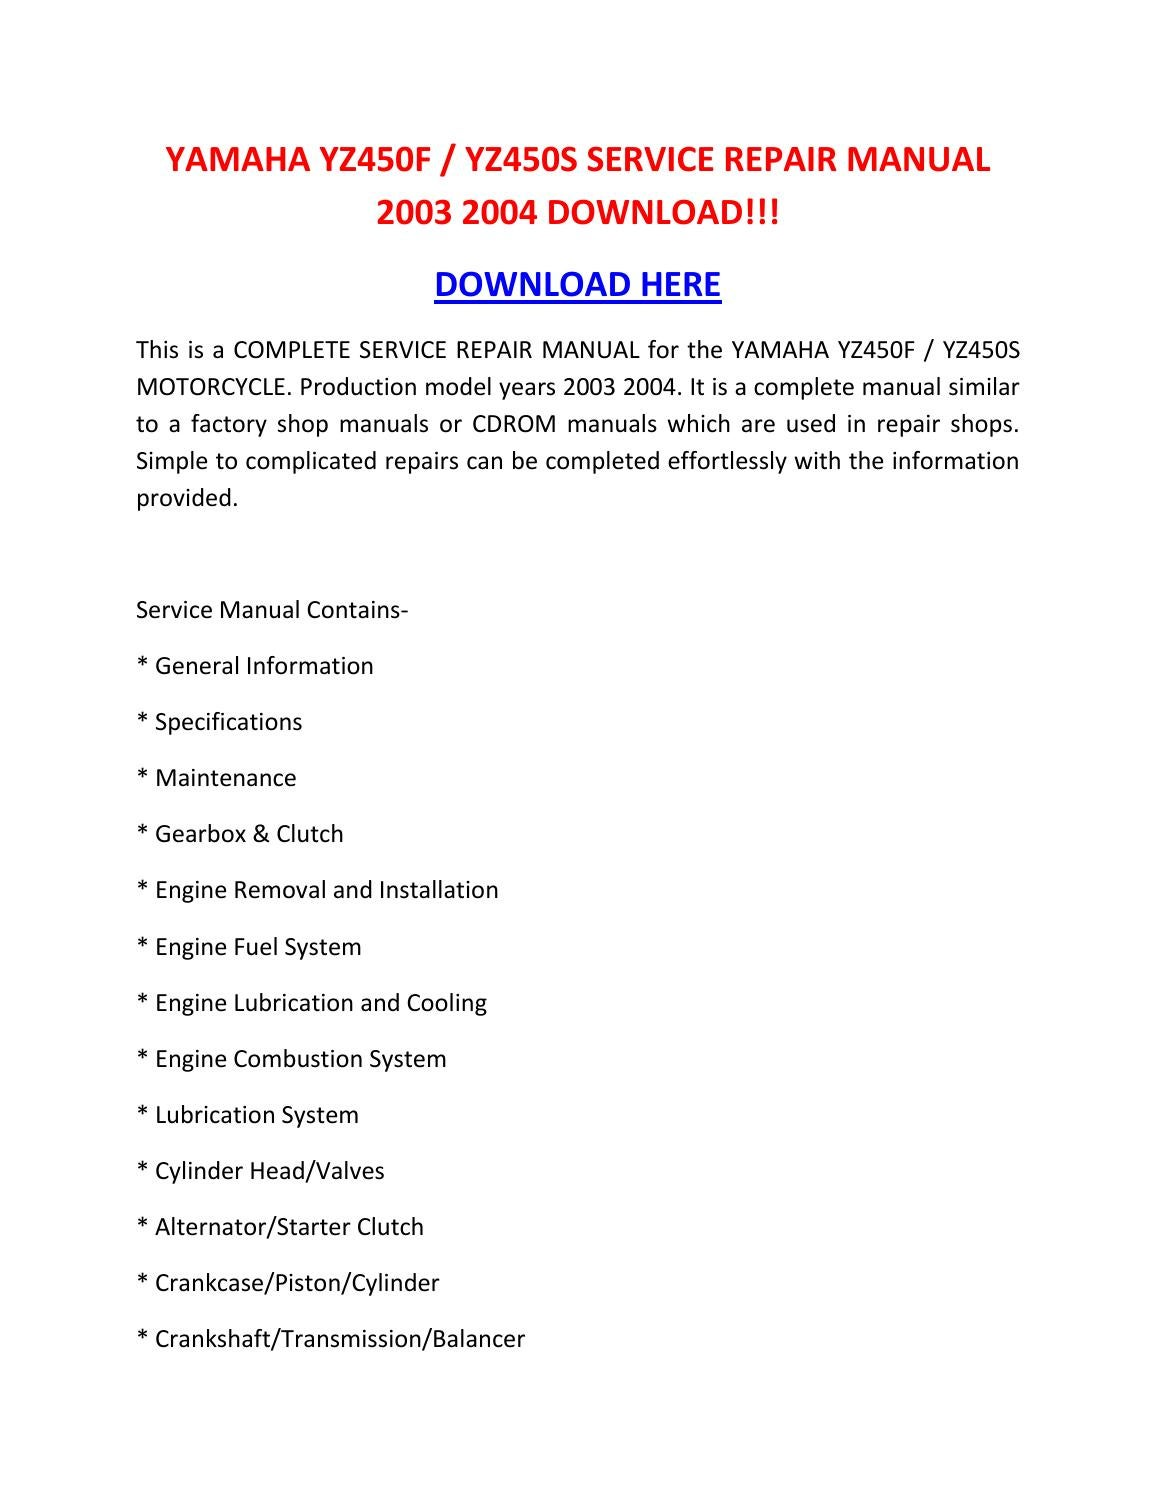 Yamaha Yz450f Yz450s Service Repair Manual 2003 2004